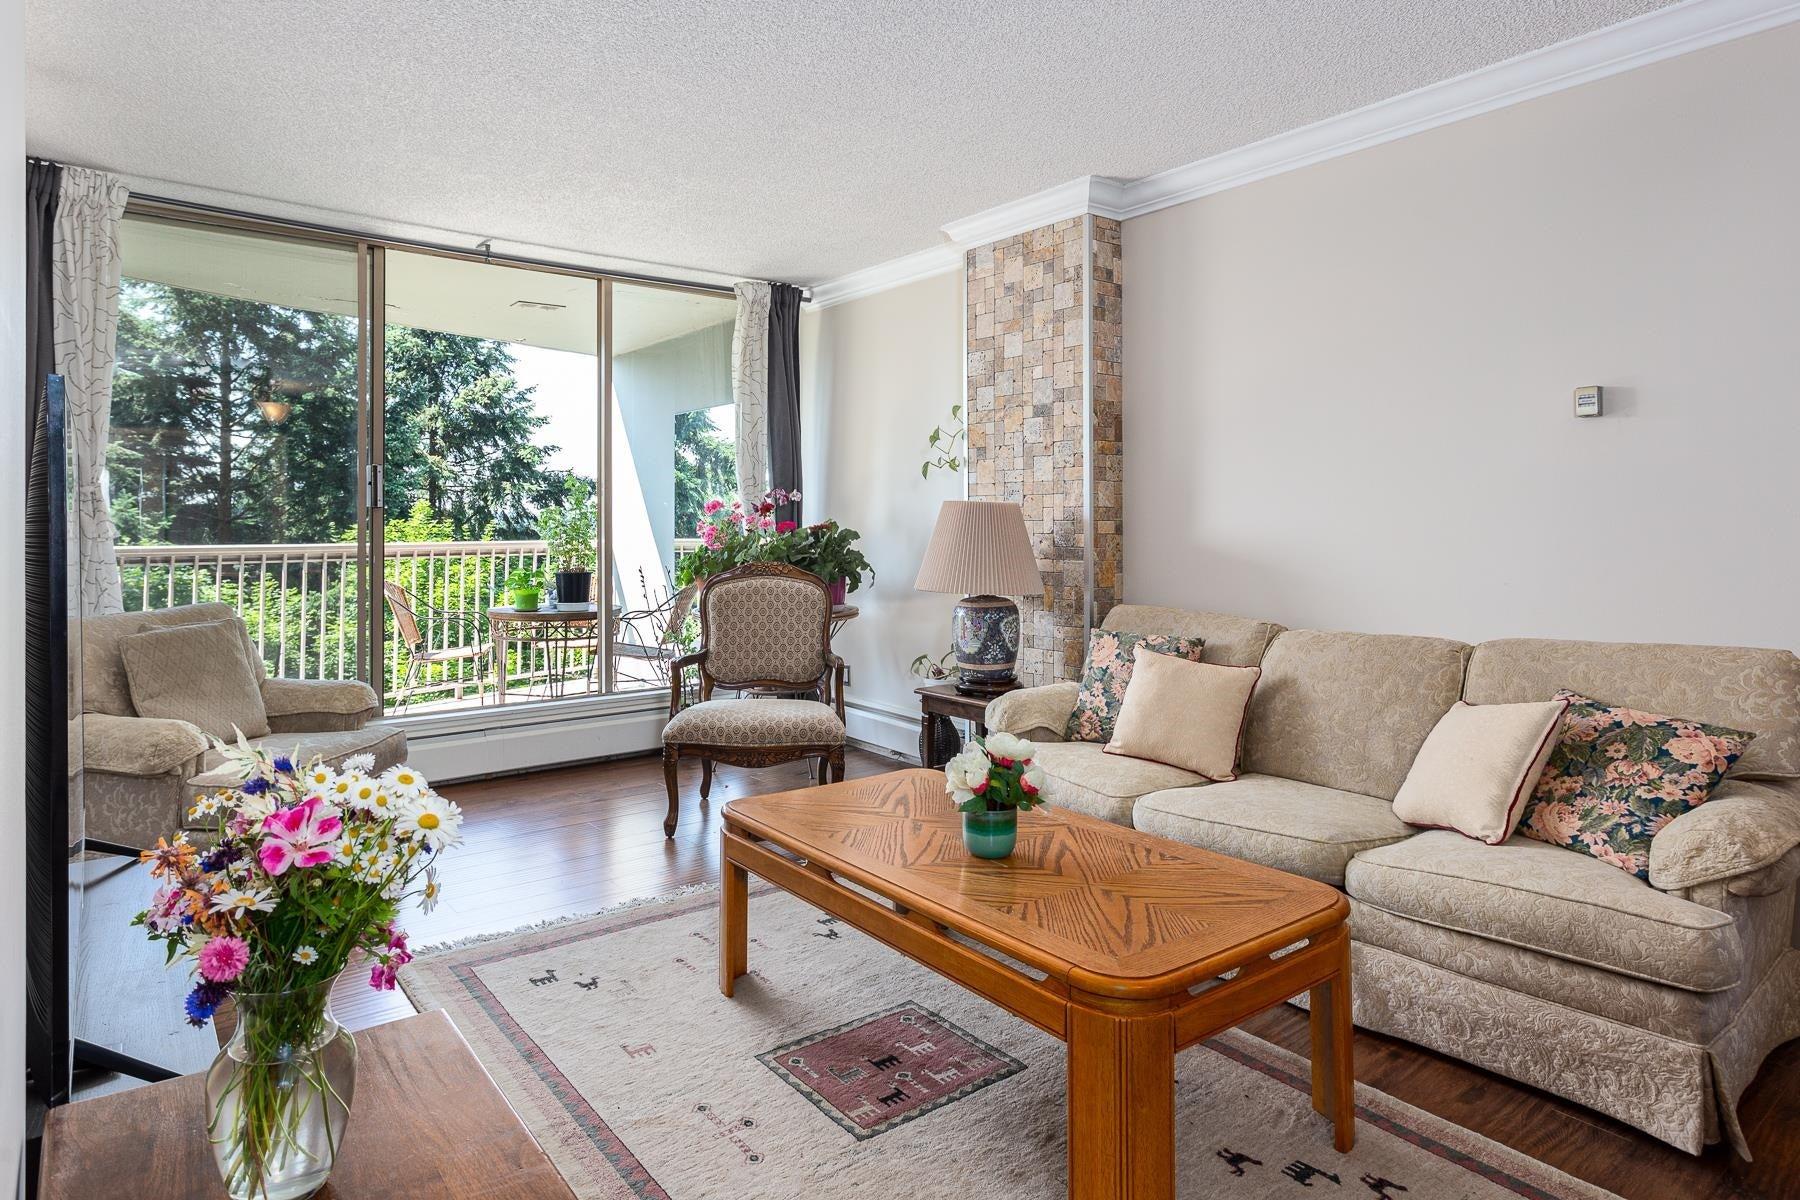 710 2024 FULLERTON AVENUE - Pemberton NV Apartment/Condo for sale, 1 Bedroom (R2621728) - #1